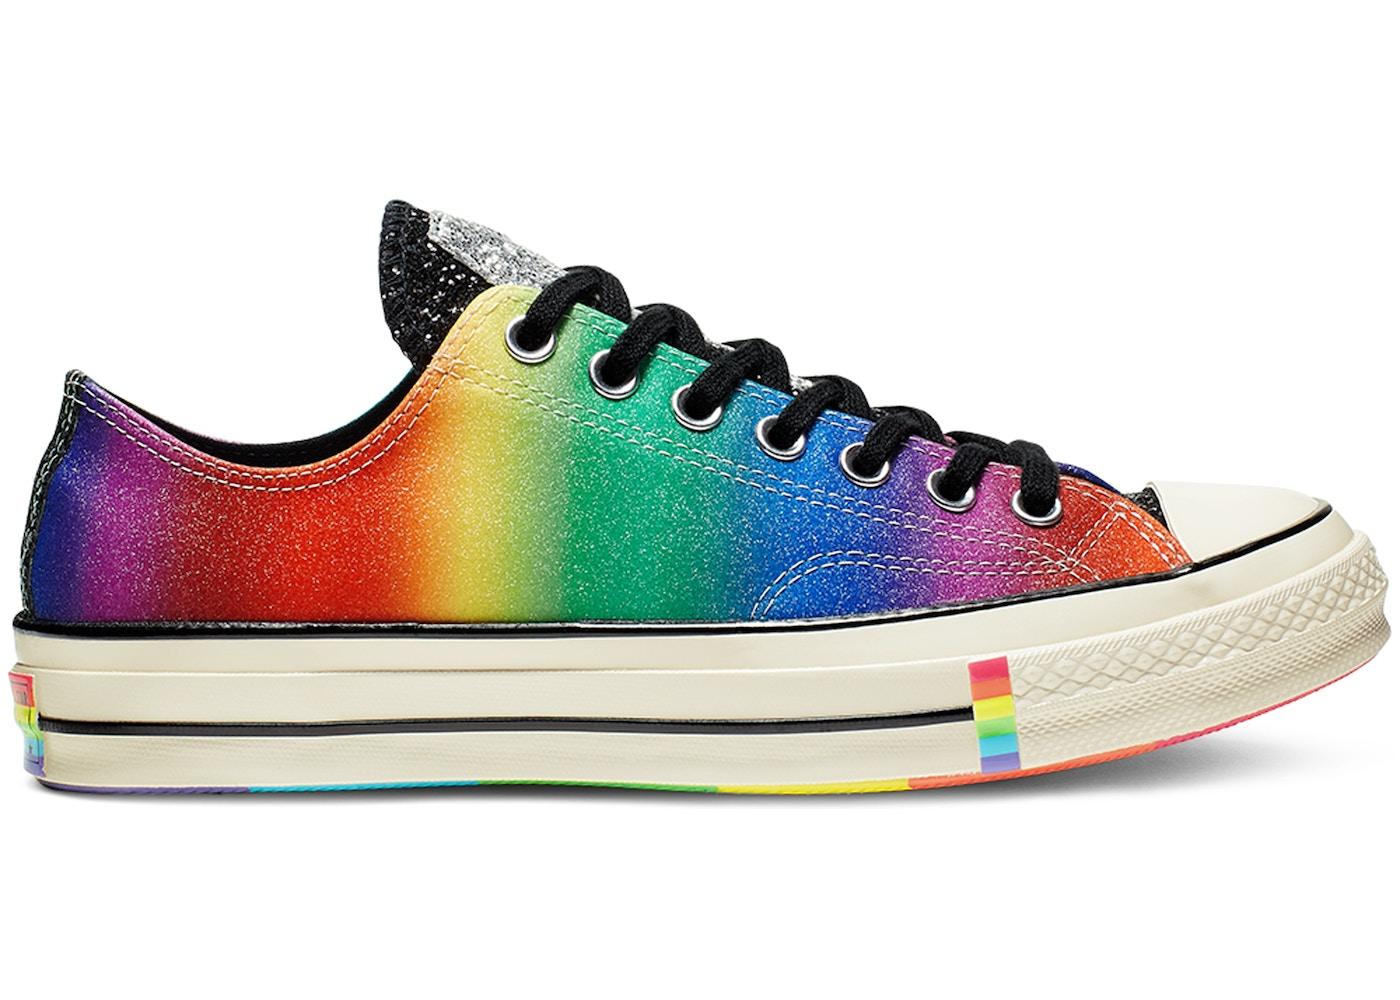 Converse Chuck Taylor All-Star 70s Ox Pride Rainbow (2019) - 165714C